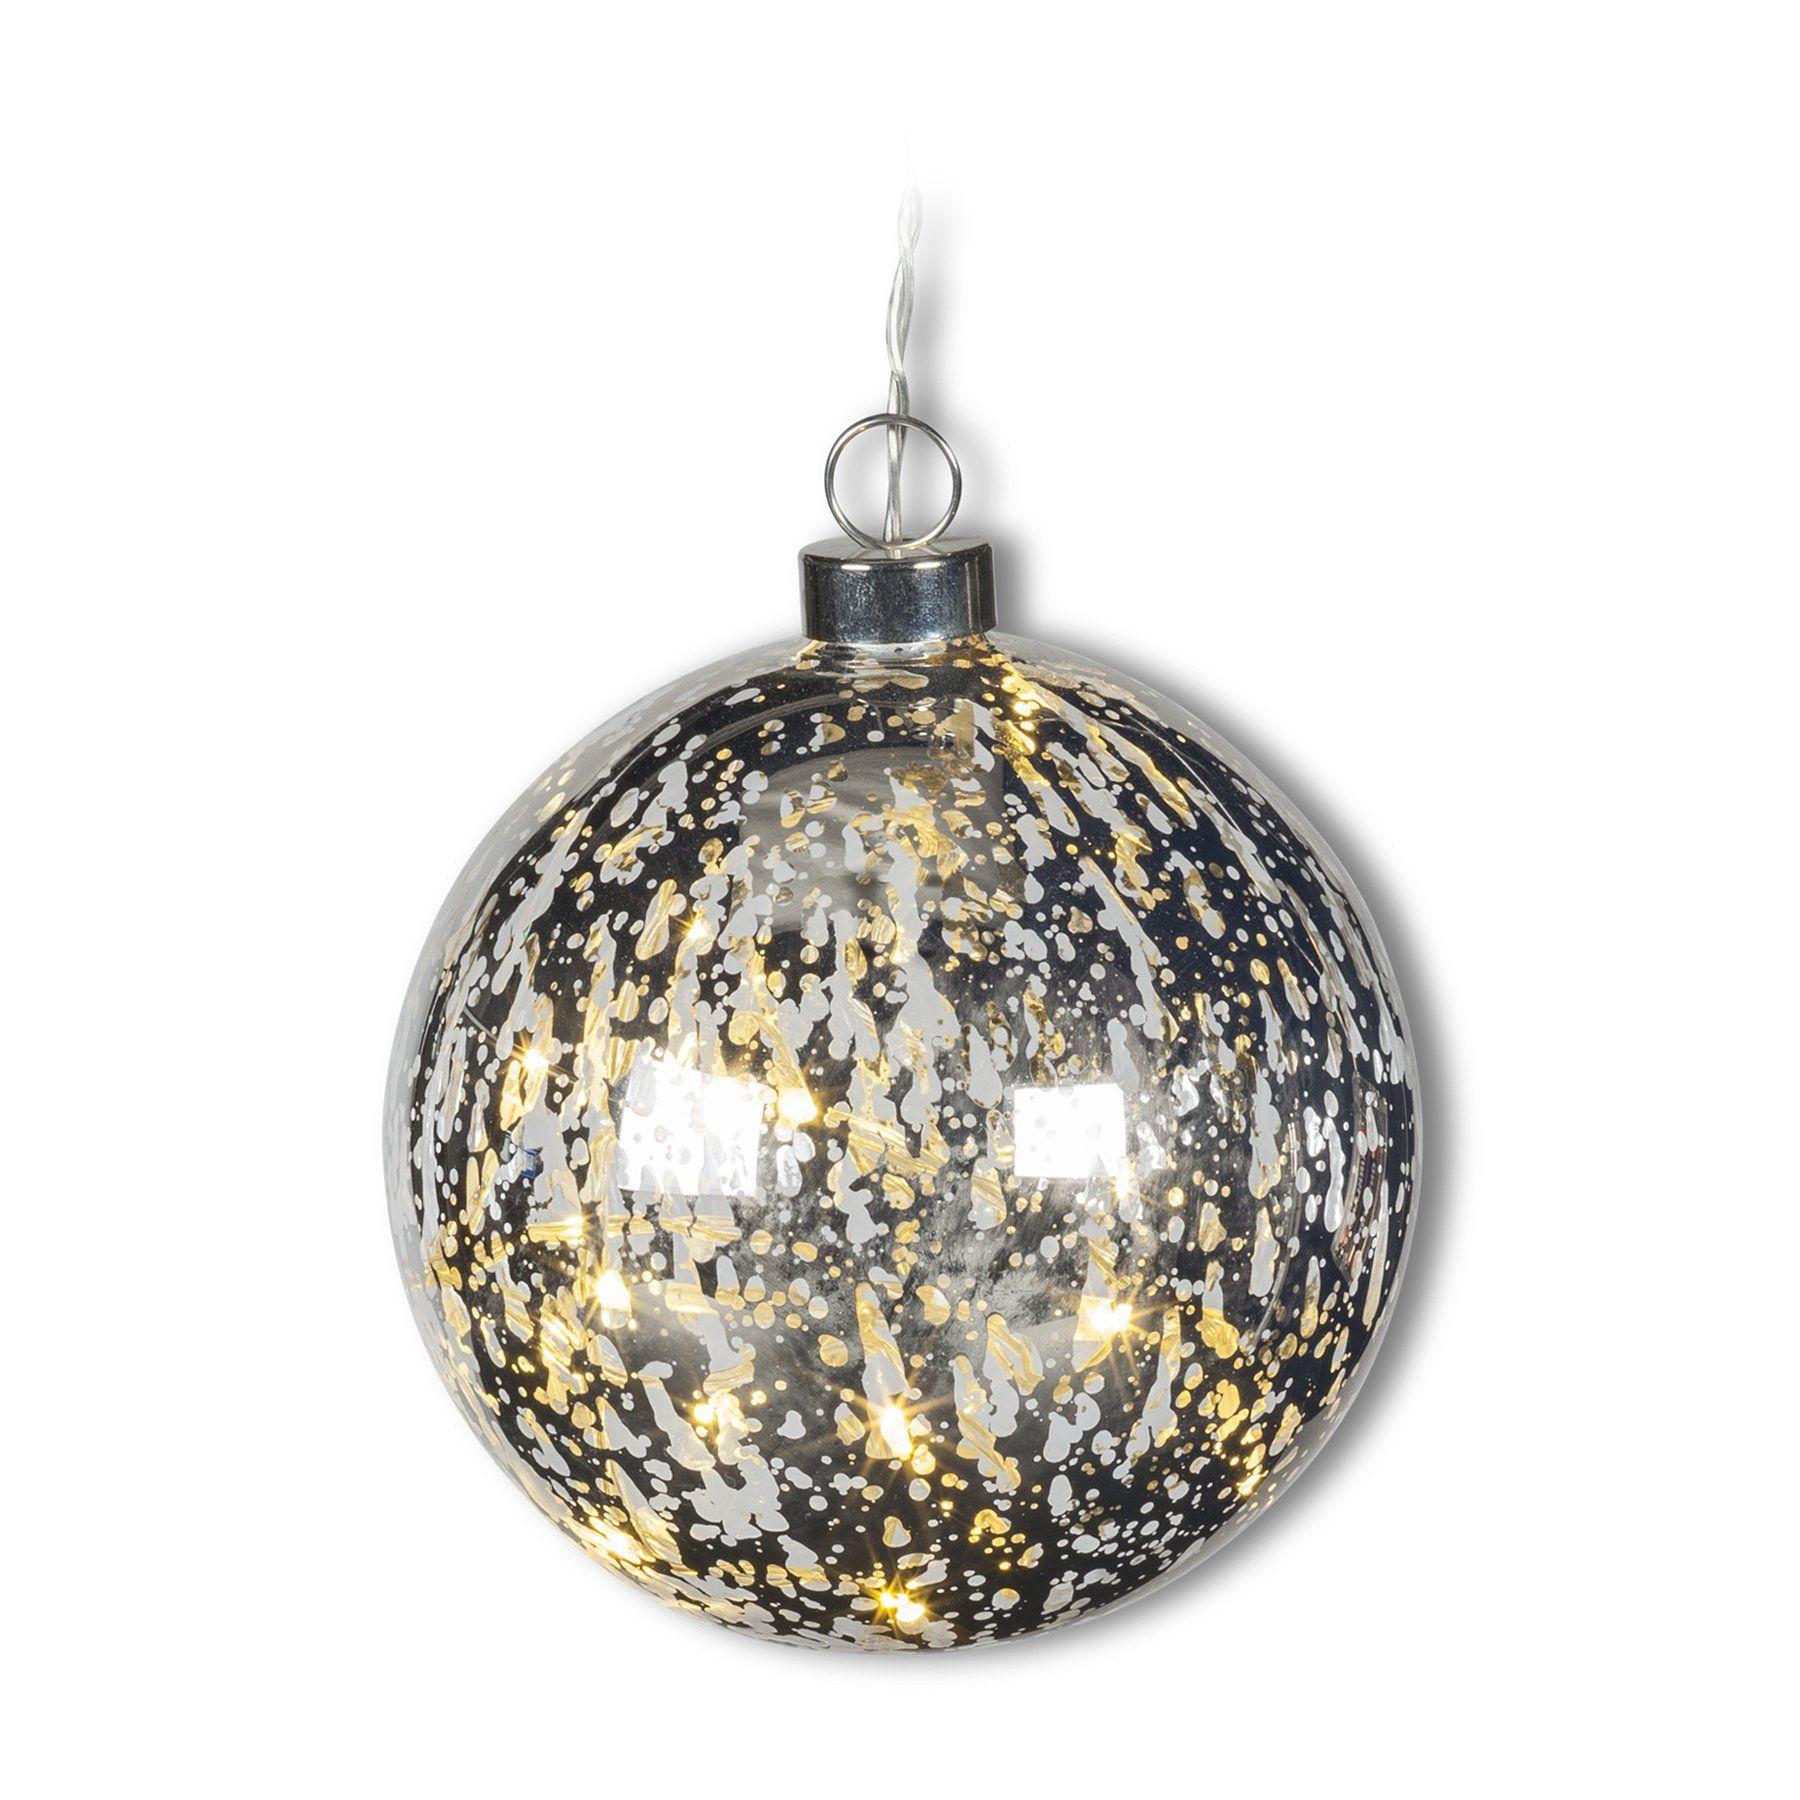 "Amazon Abbott Collection Hanging Ball Light 4 5"" Antique"